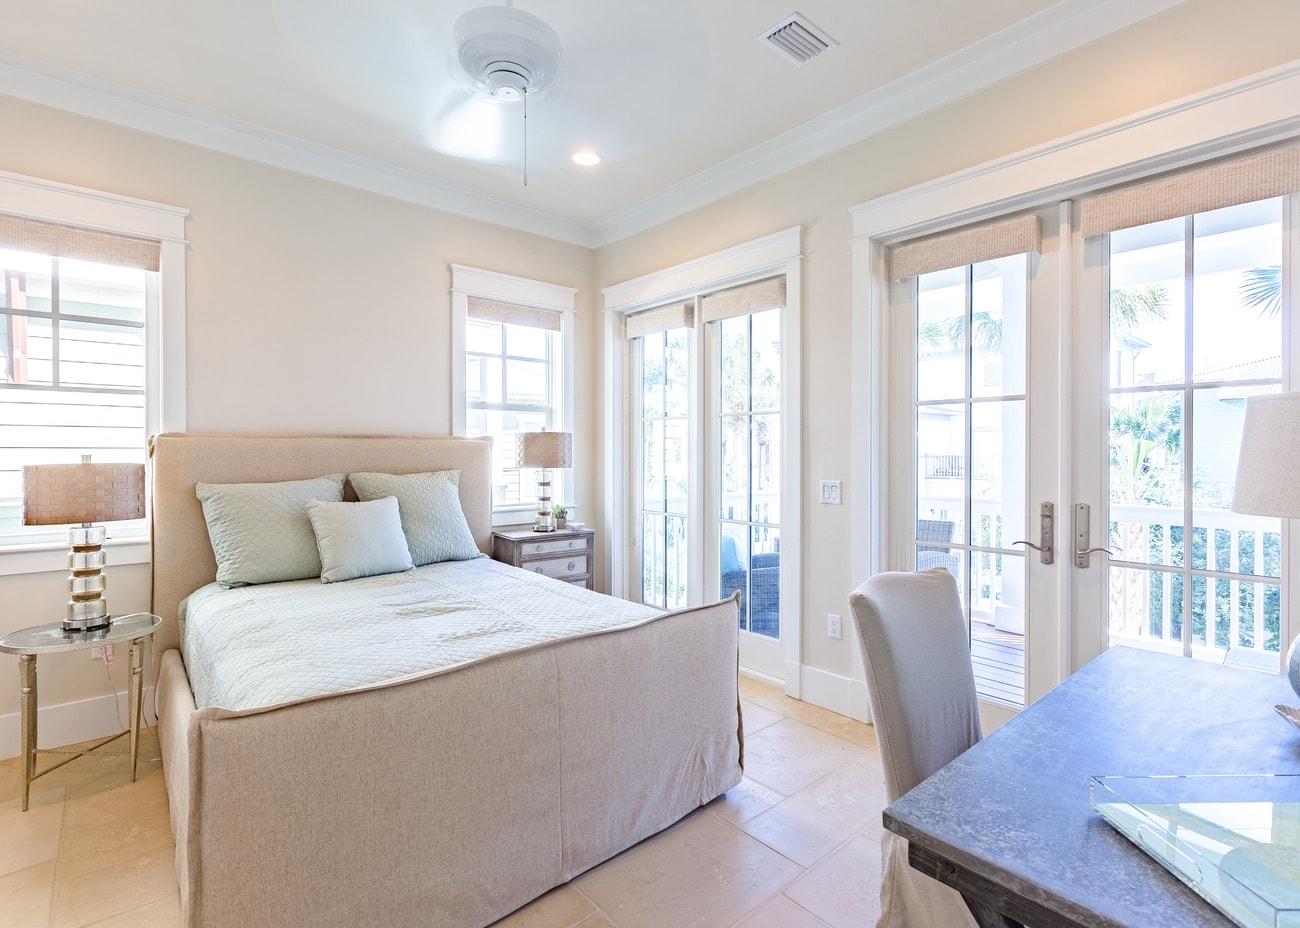 Home interior design by Sugar Beach Interiors, Panama City Beach, Florida.